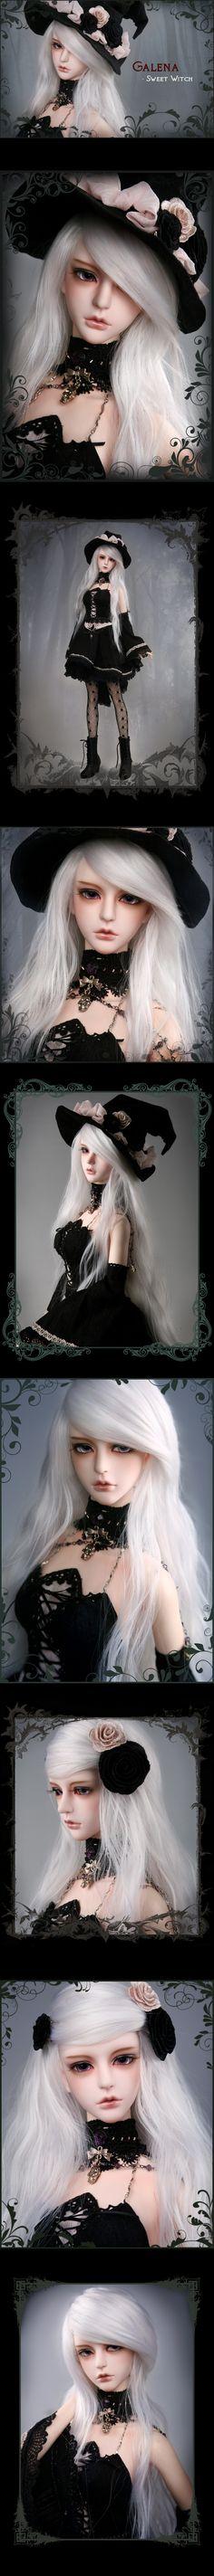 the SOOM emporium Galena-Sweet witch #bjd